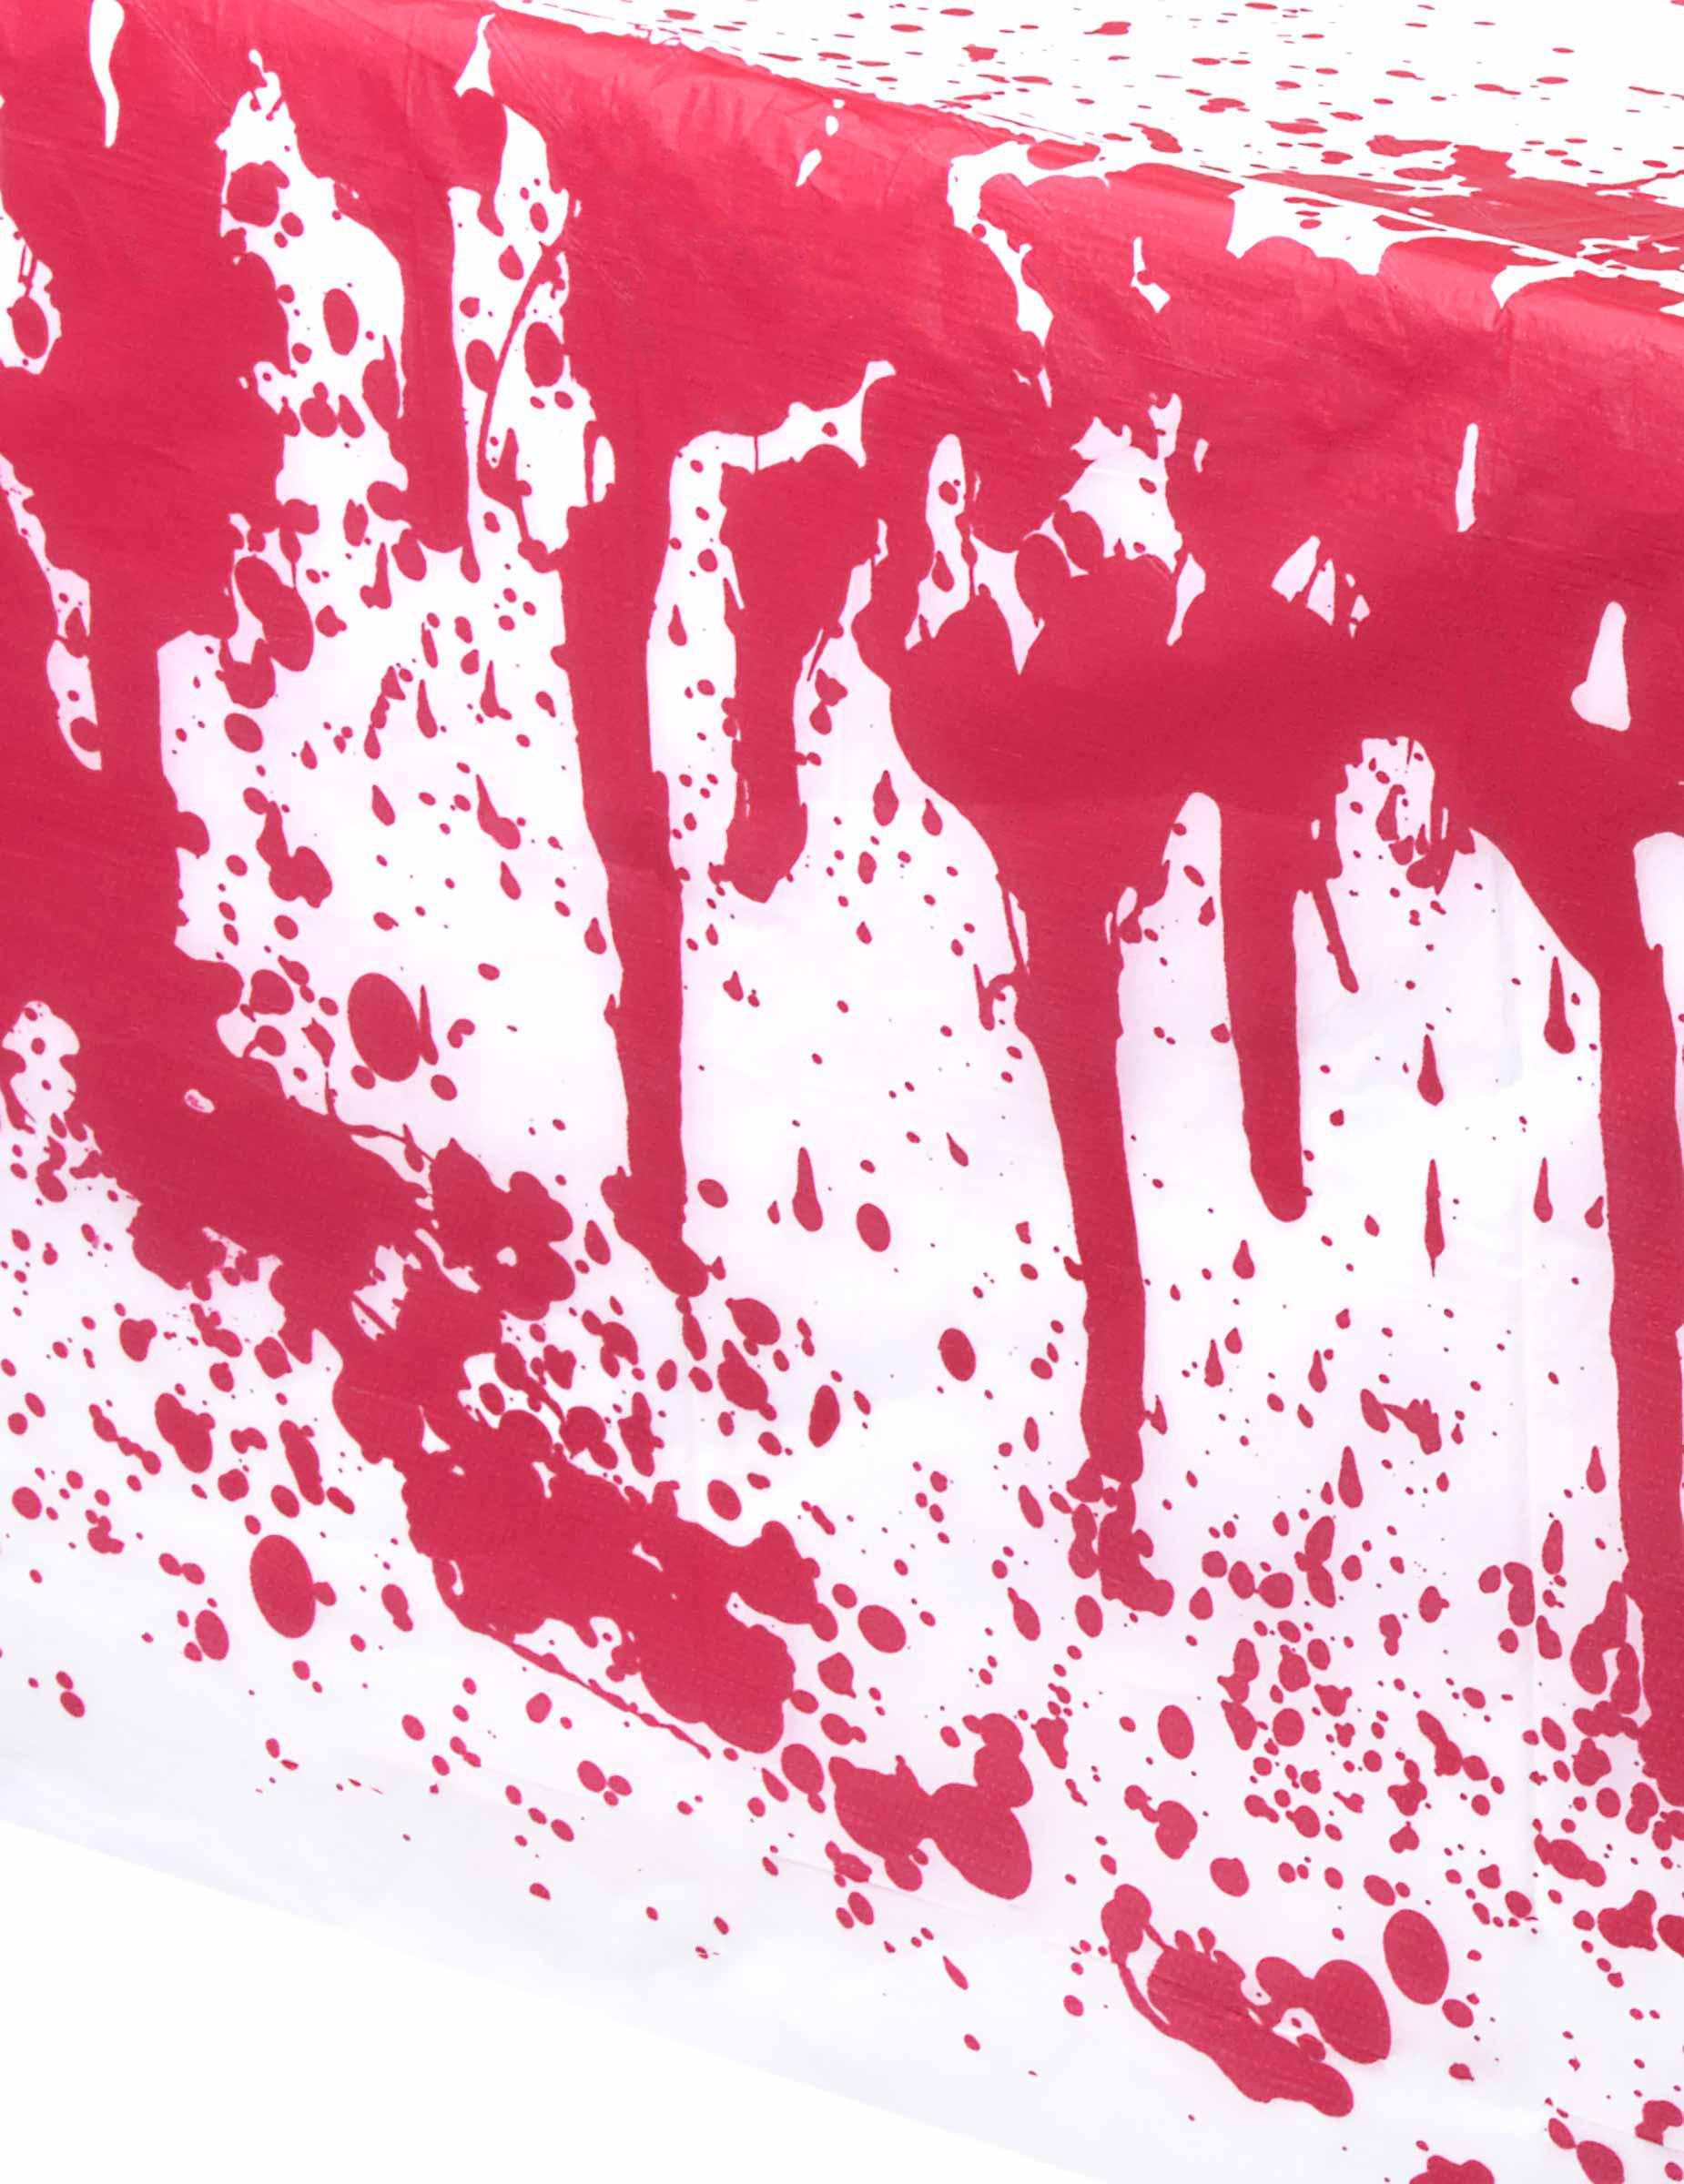 blutige tischdecke halloween tischdeko rot weiss. Black Bedroom Furniture Sets. Home Design Ideas